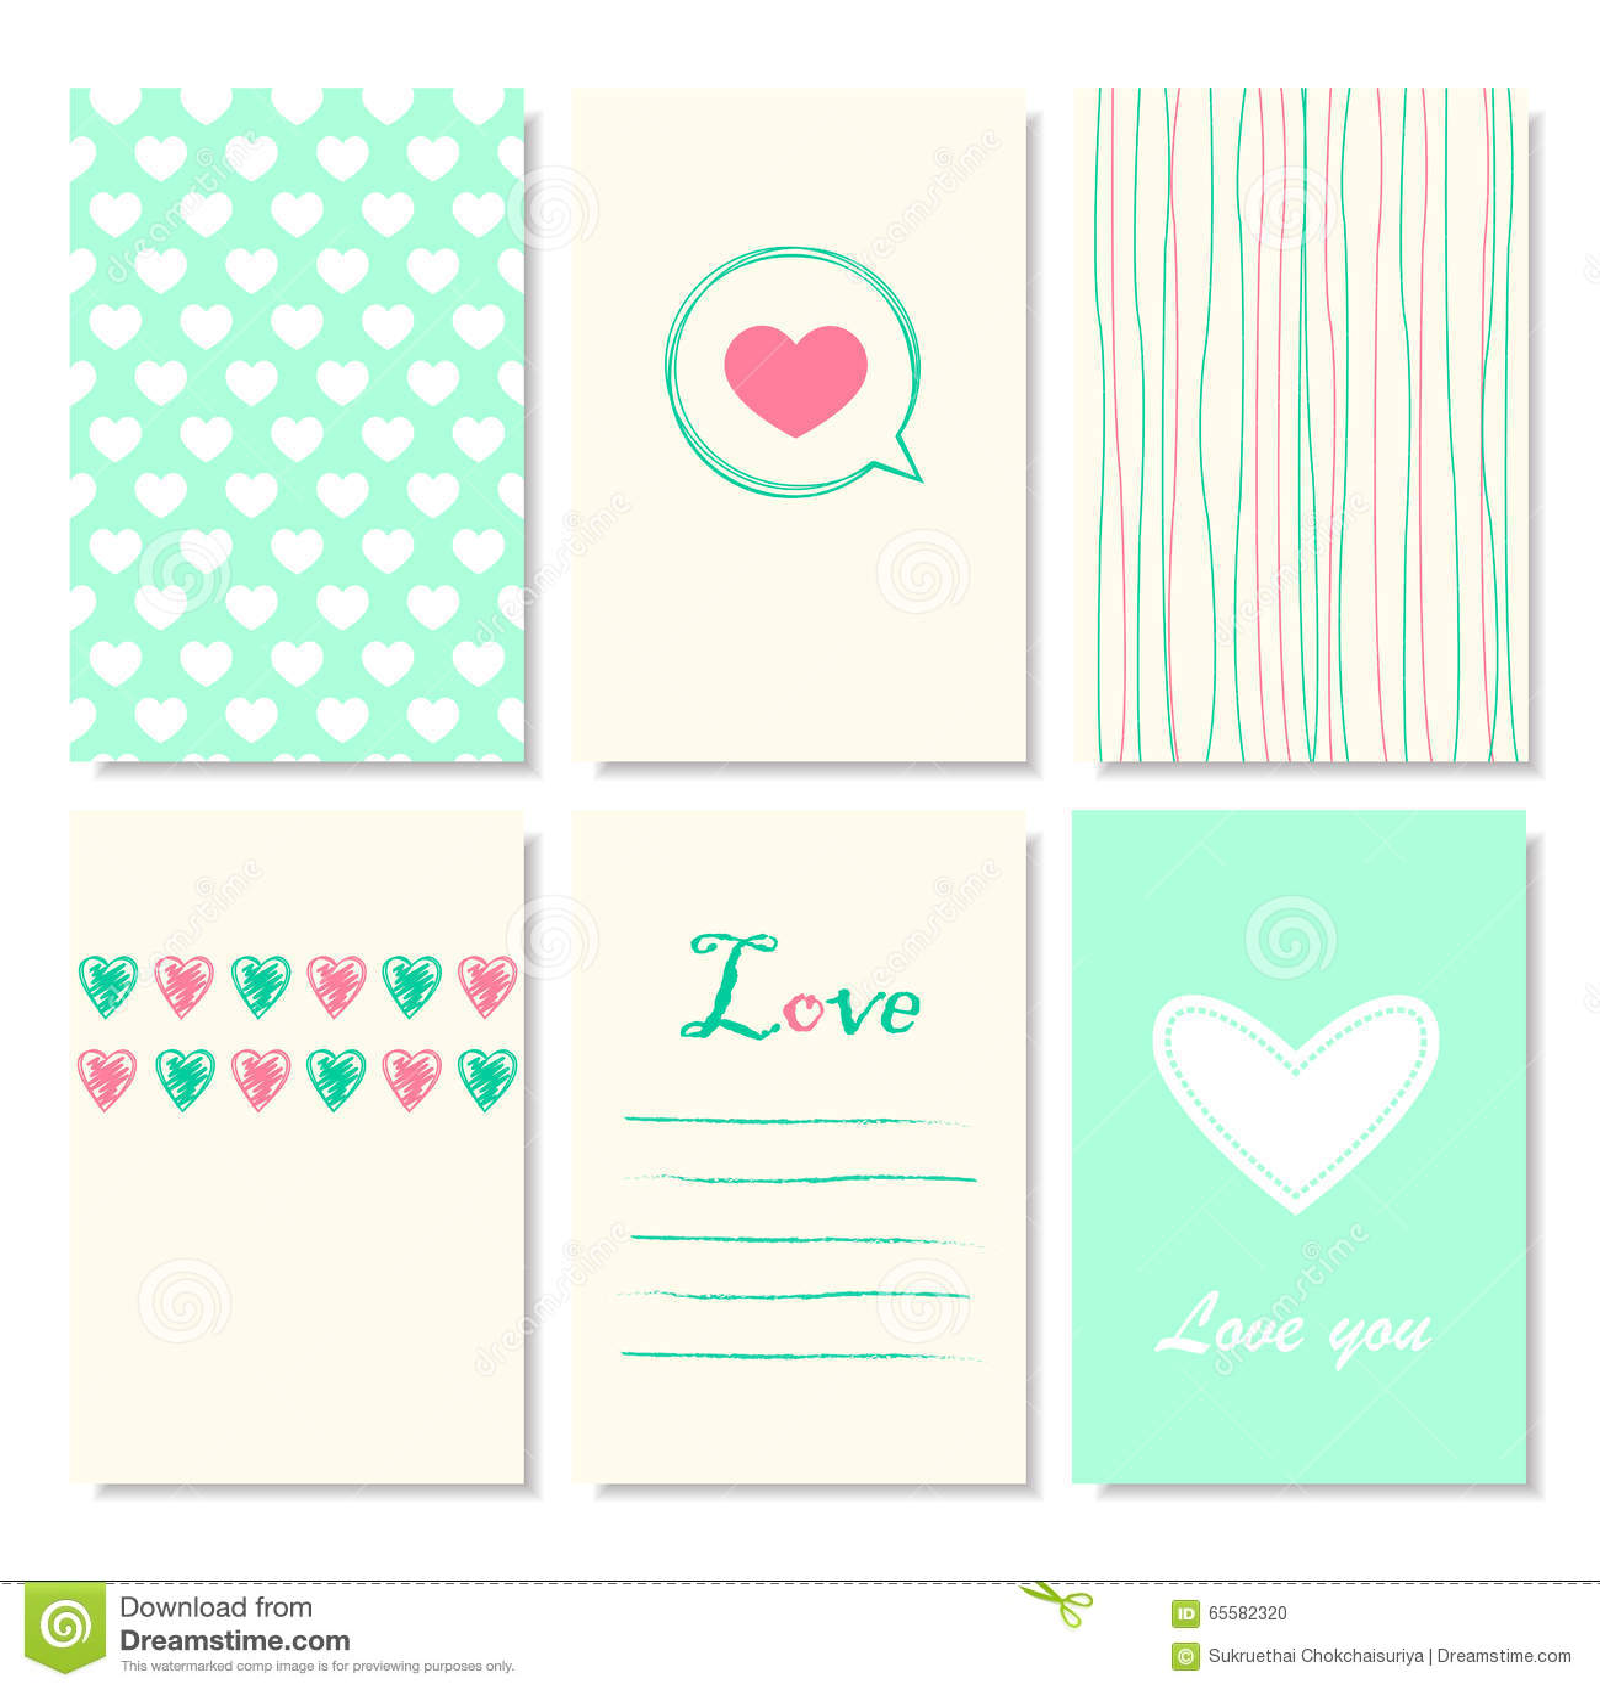 cute creative cards templates stock illustration illustration of